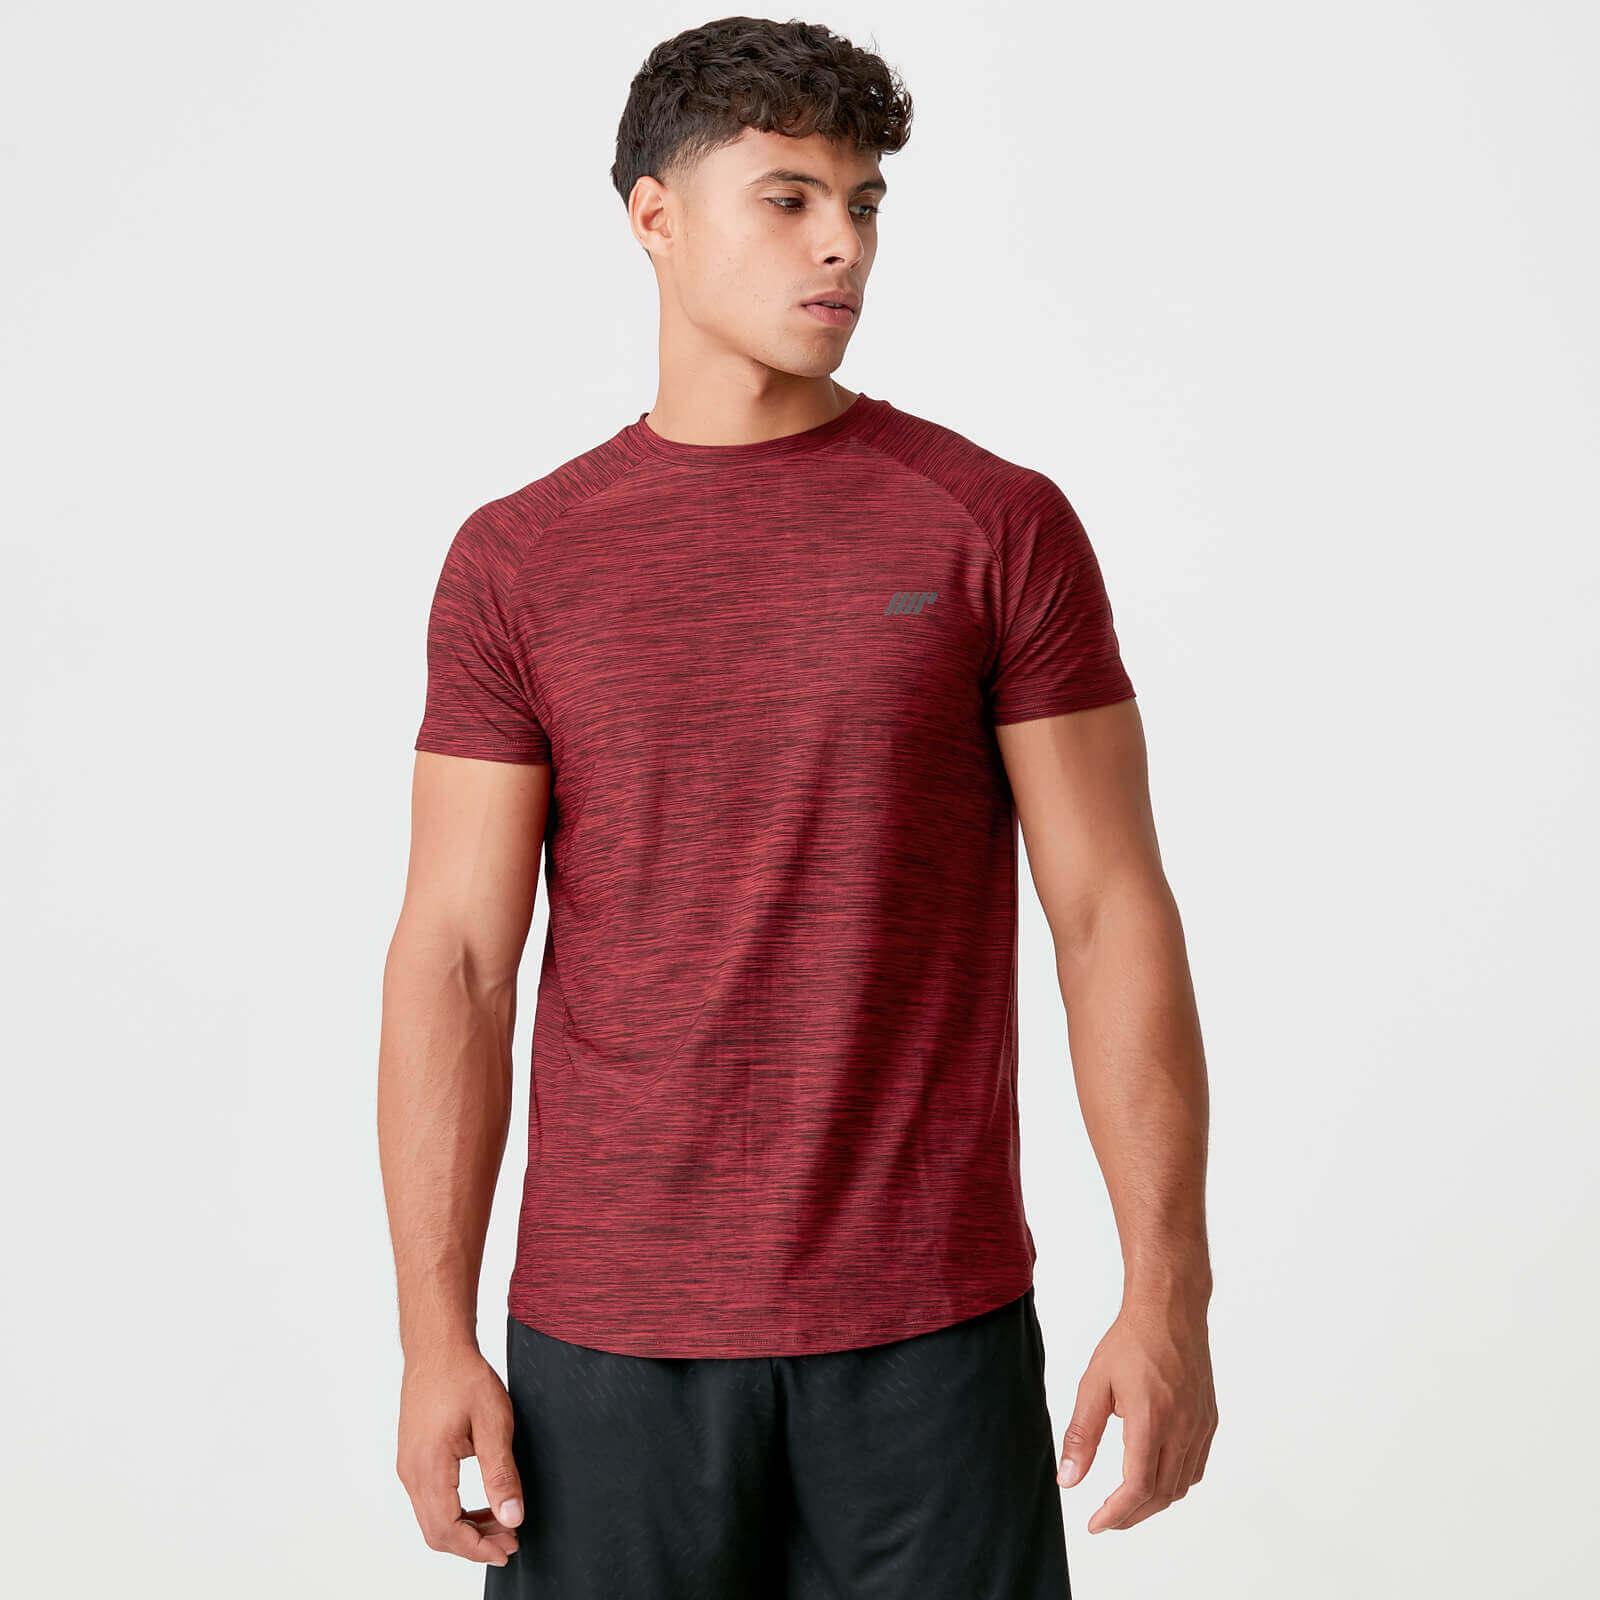 5e8a05dd1 Dry-Tech Infinity T-Shirt - Red Marl